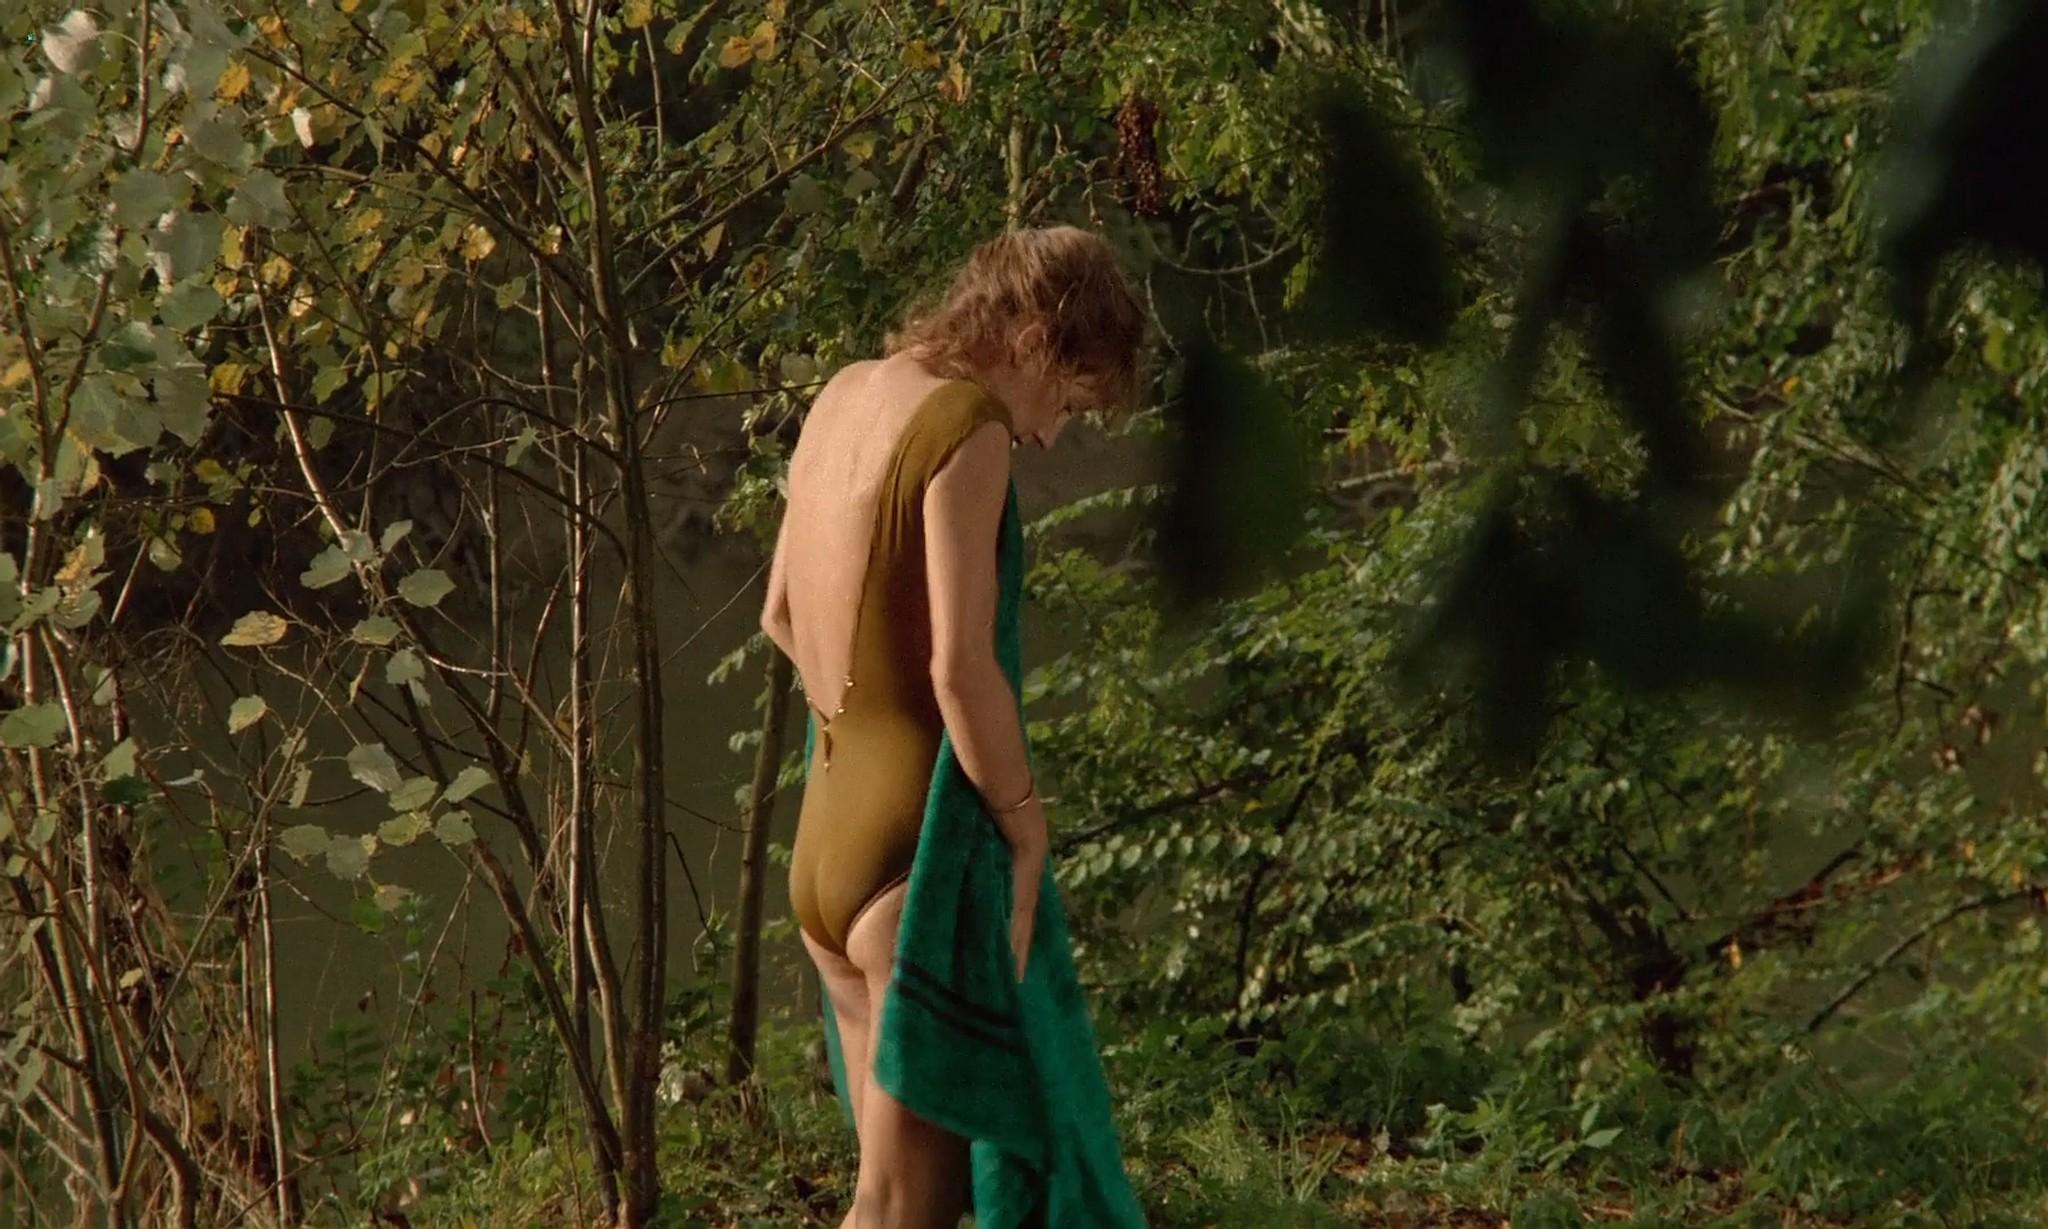 Nathalie Baye nude in the shower En toute innocence FR 1988 1080p BluRay 7